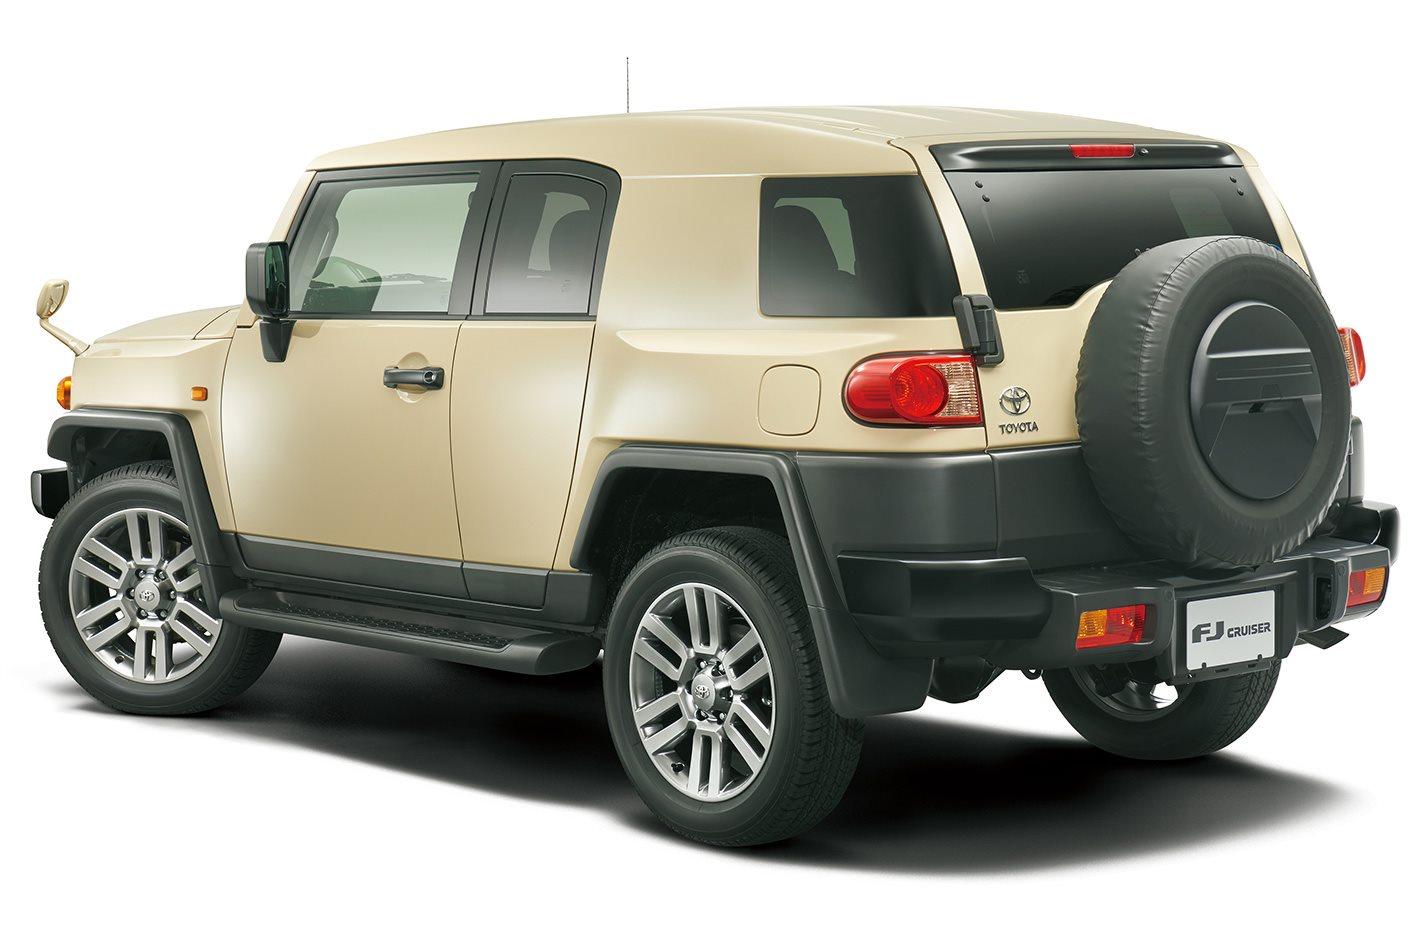 FJ-Cruiser-Final-Edition-rear.jpg